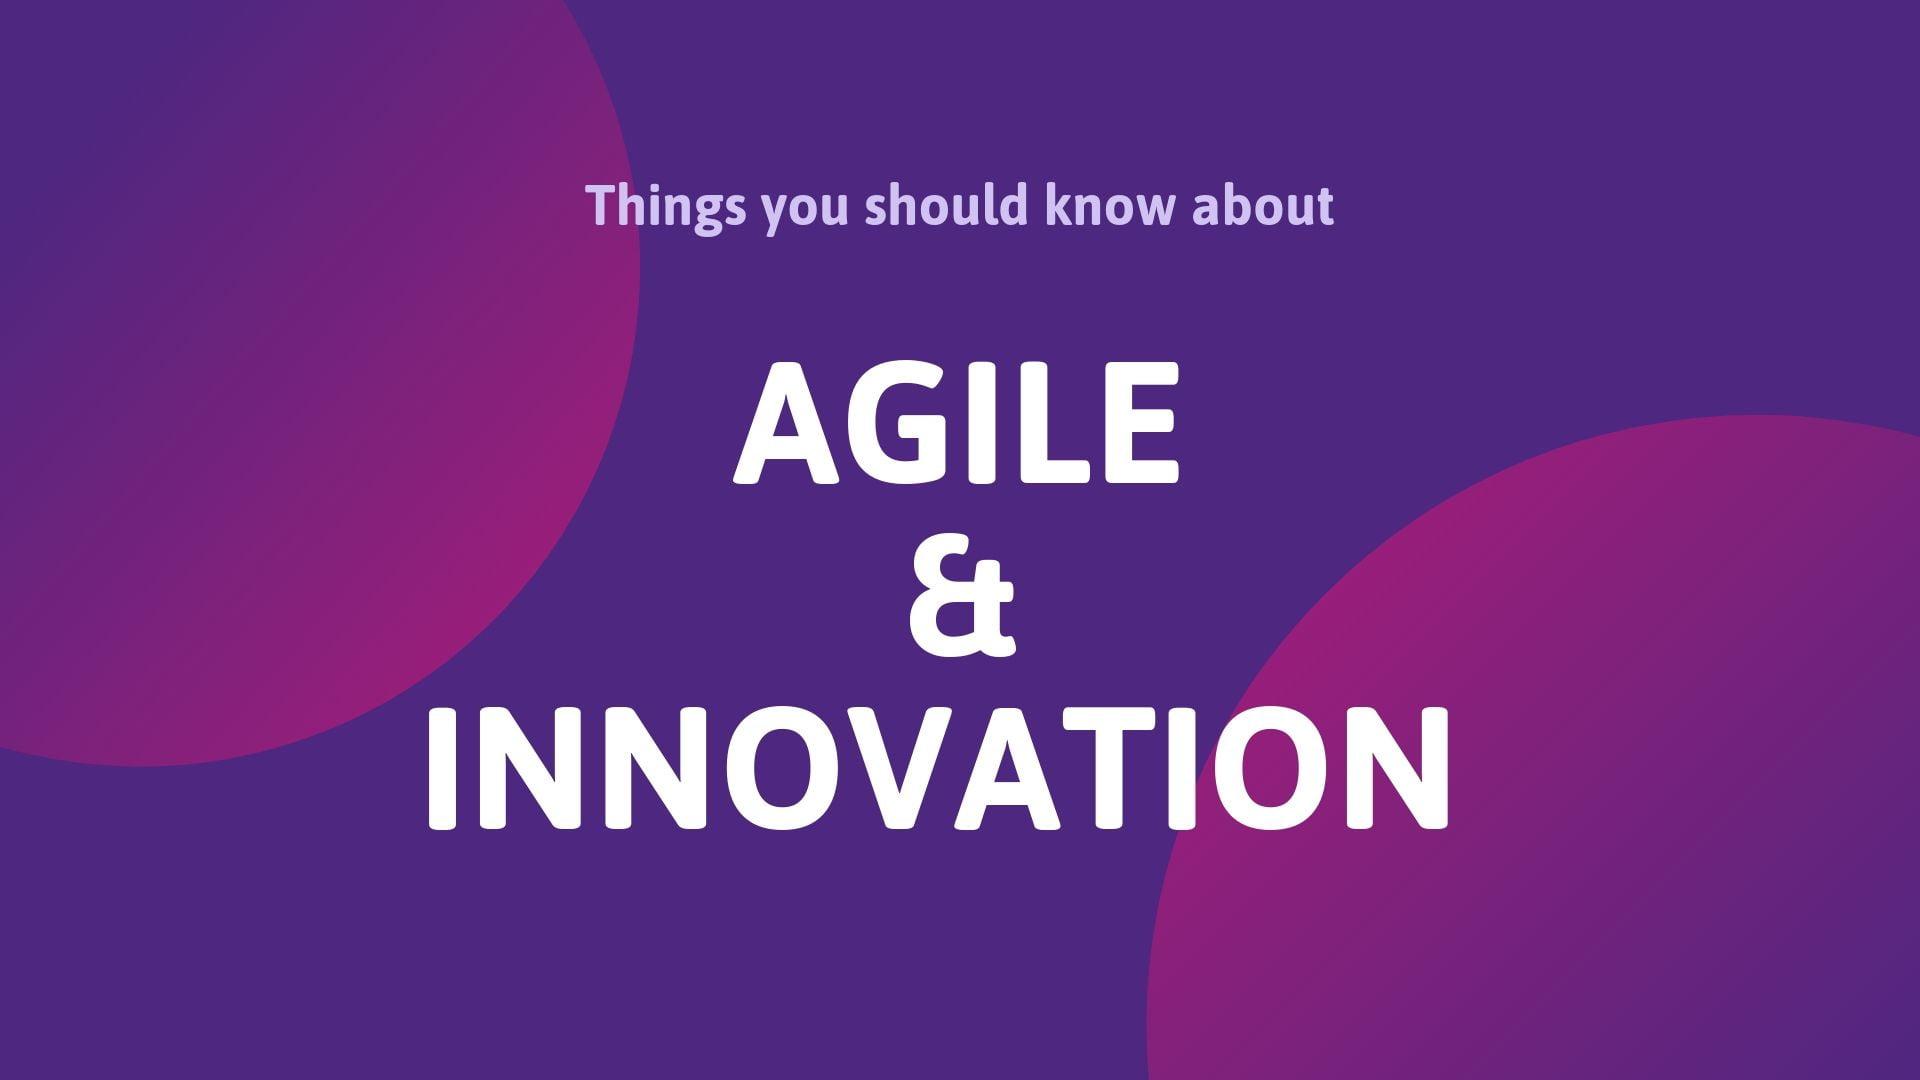 Agile and Innovation